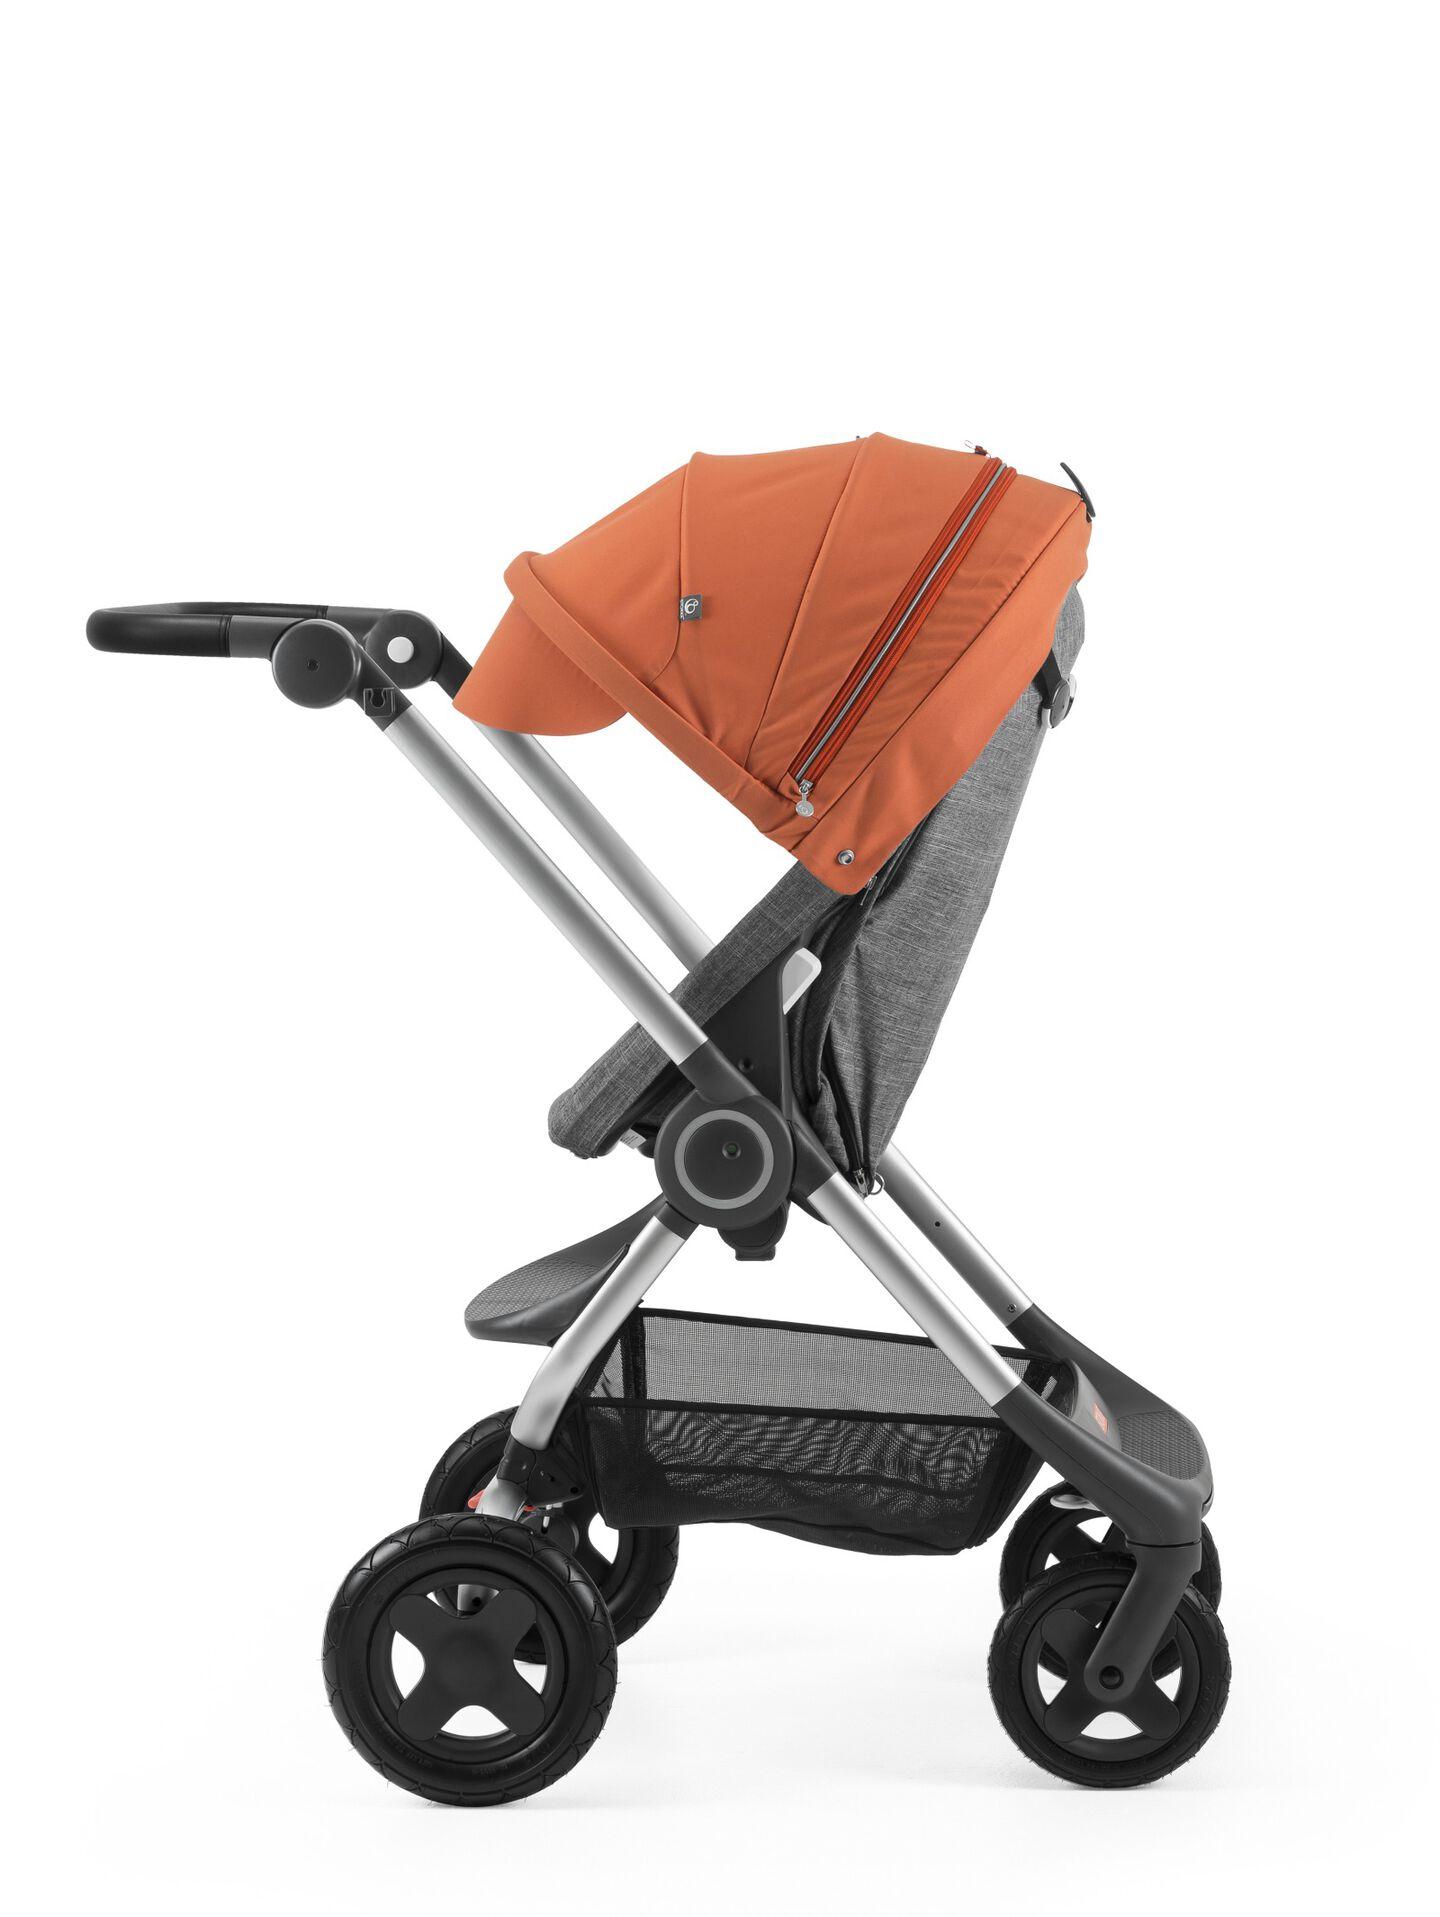 Stokke® Scoot™ Black Melange with Orange Canopy. Parent facing, active position.